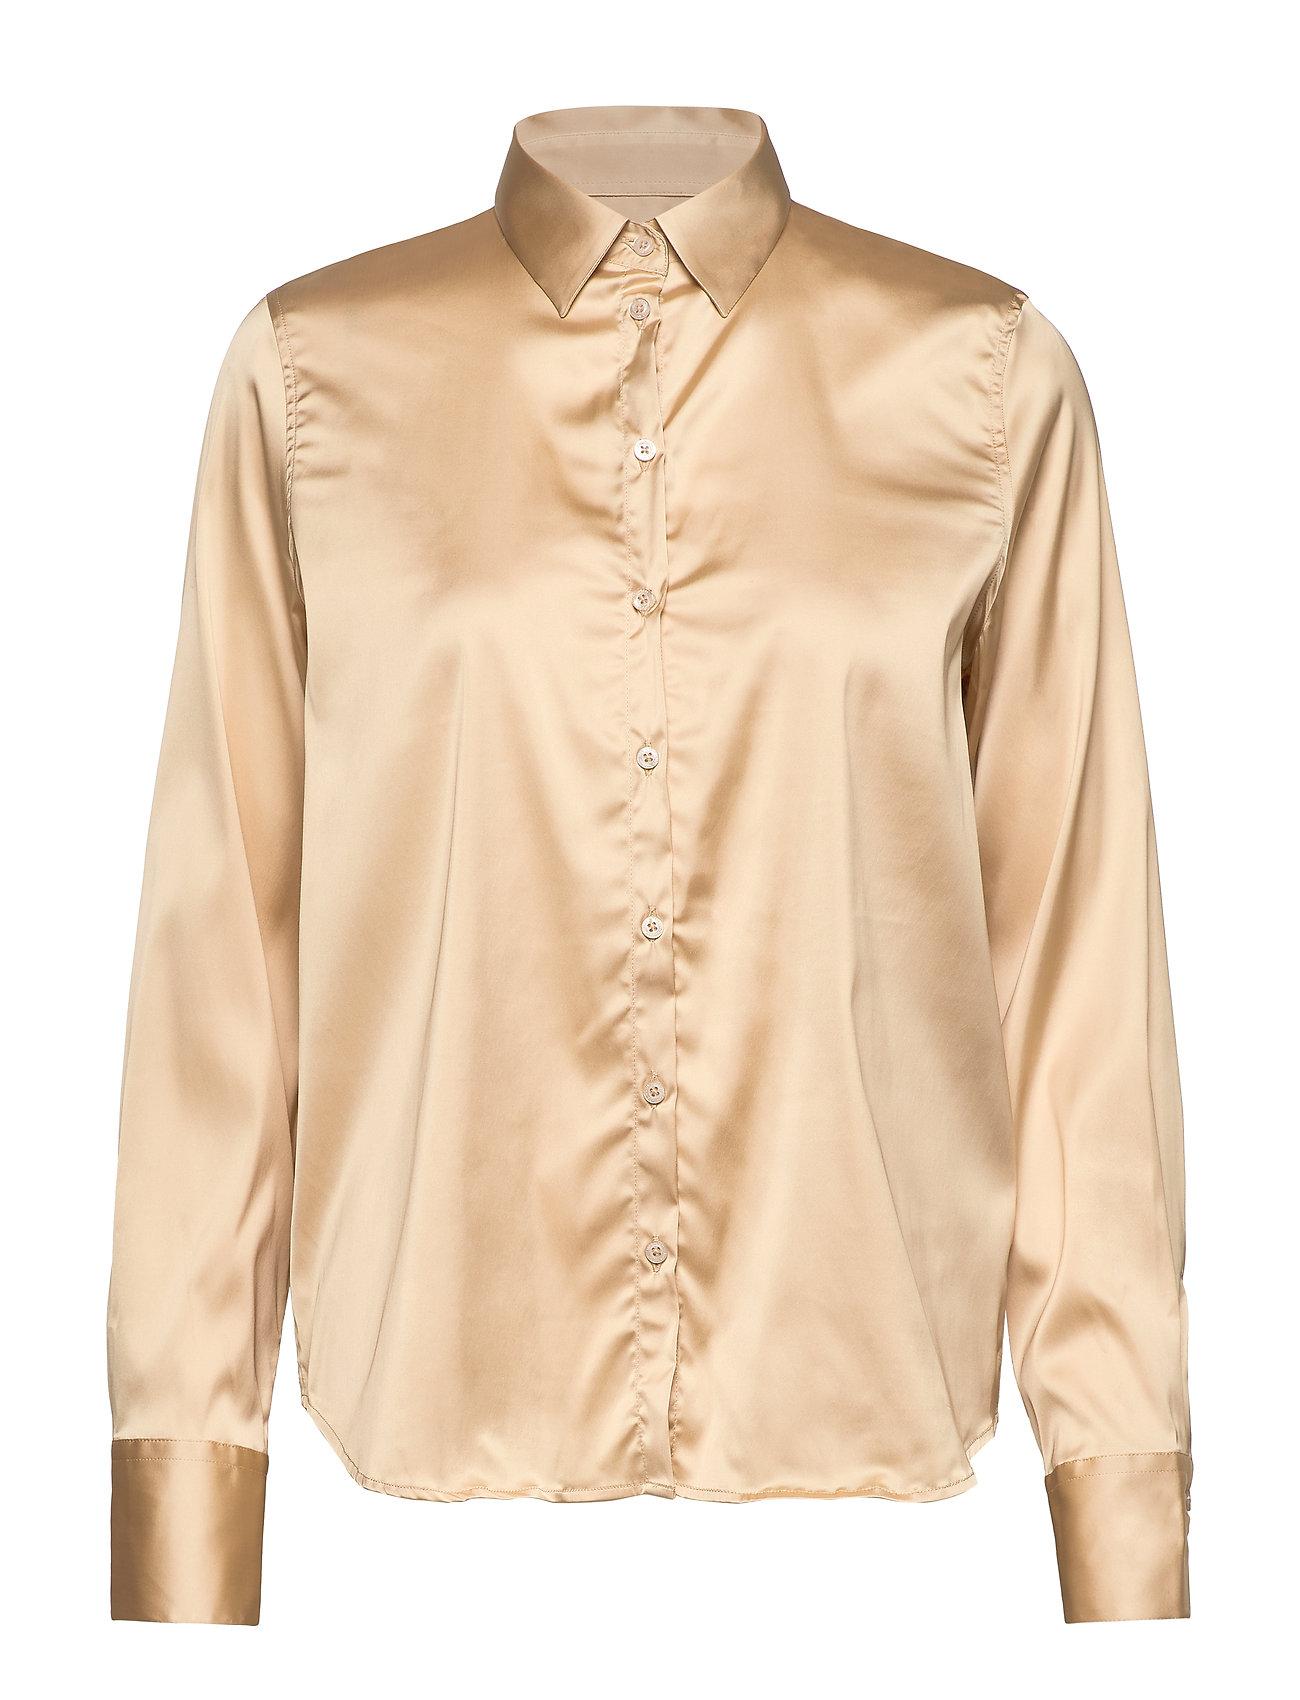 MOS MOSH Martina Satin Shirt - PEBBLE